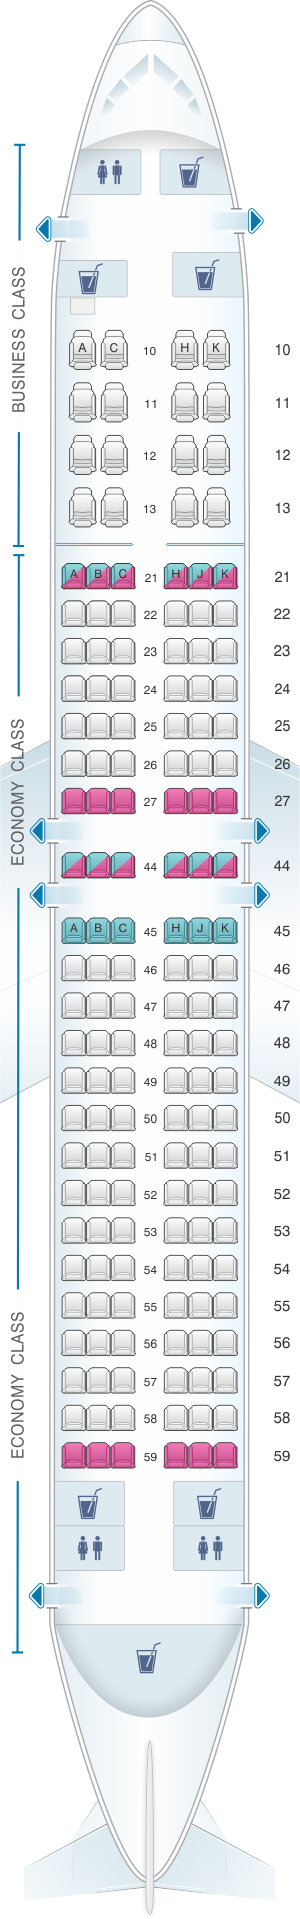 Seat map for El Al Israel Airlines Boeing B737 800 154pax